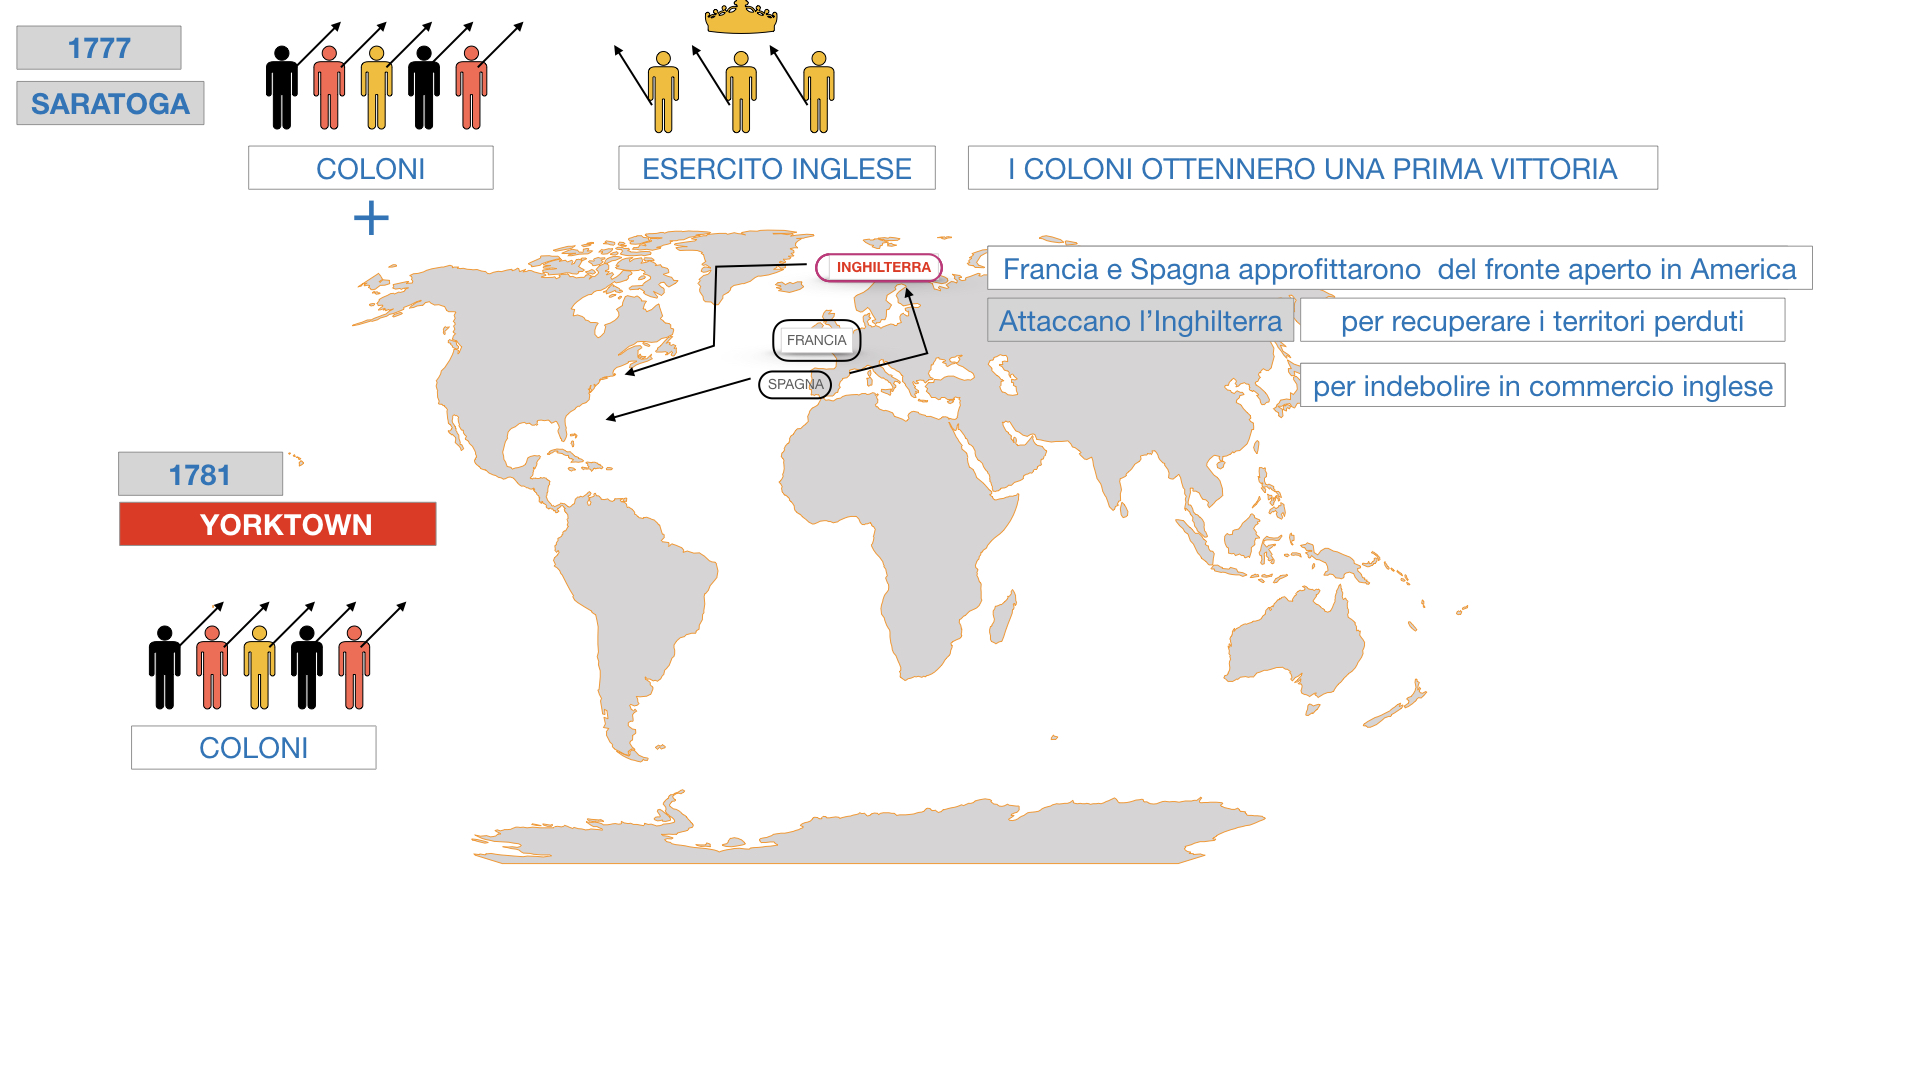 GUERRA DI INDIPENDENZA AMERICANA_SIMULAZIONE.130